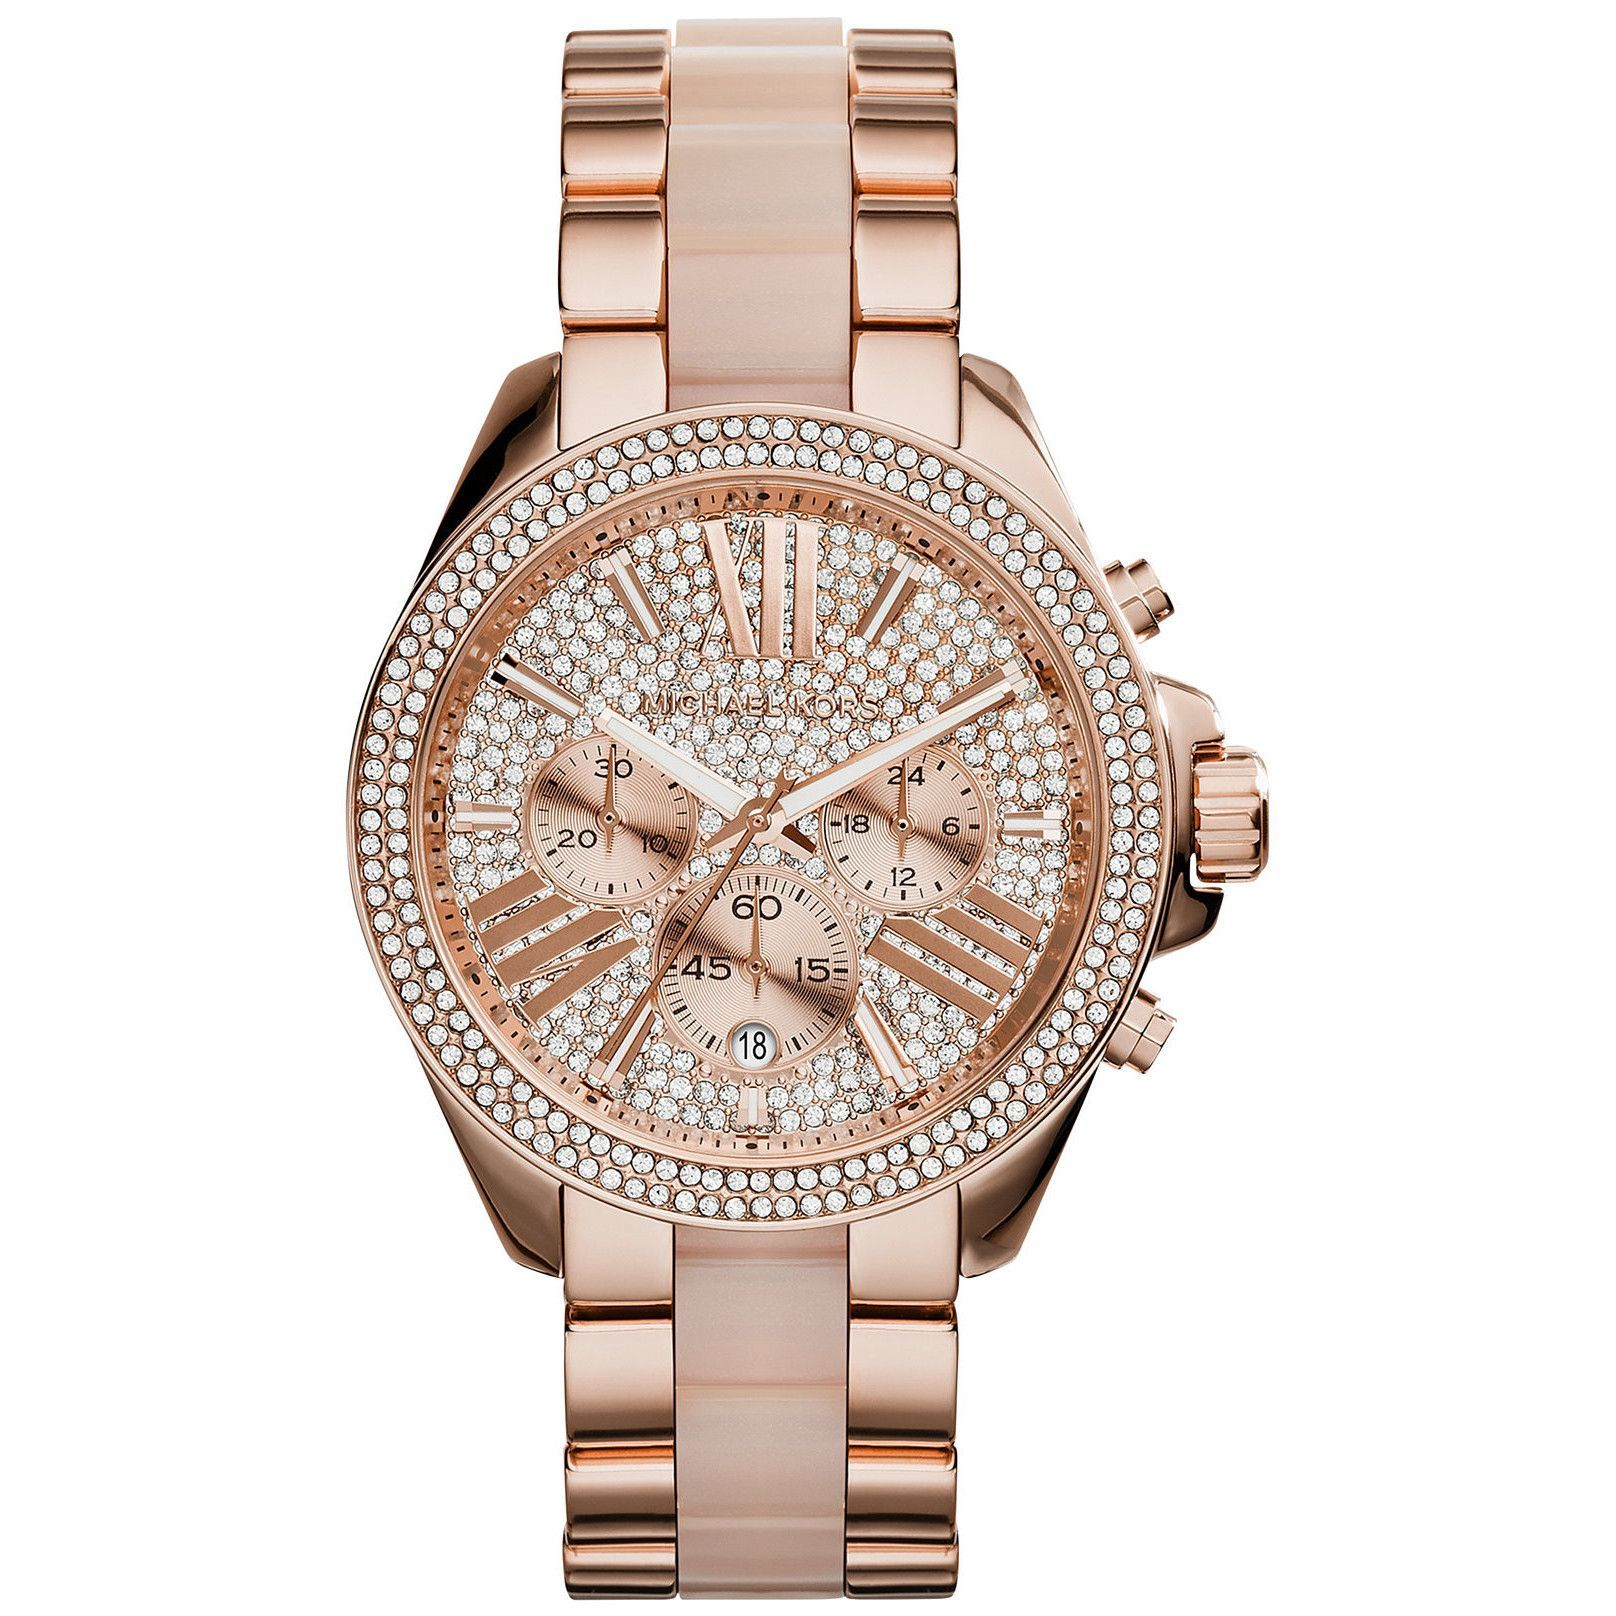 9e6cca08de3e Michael Kors Women s MK6096  Wren  Chronograph Crystal Rose Gold Tone  Stainless Steel Watch (